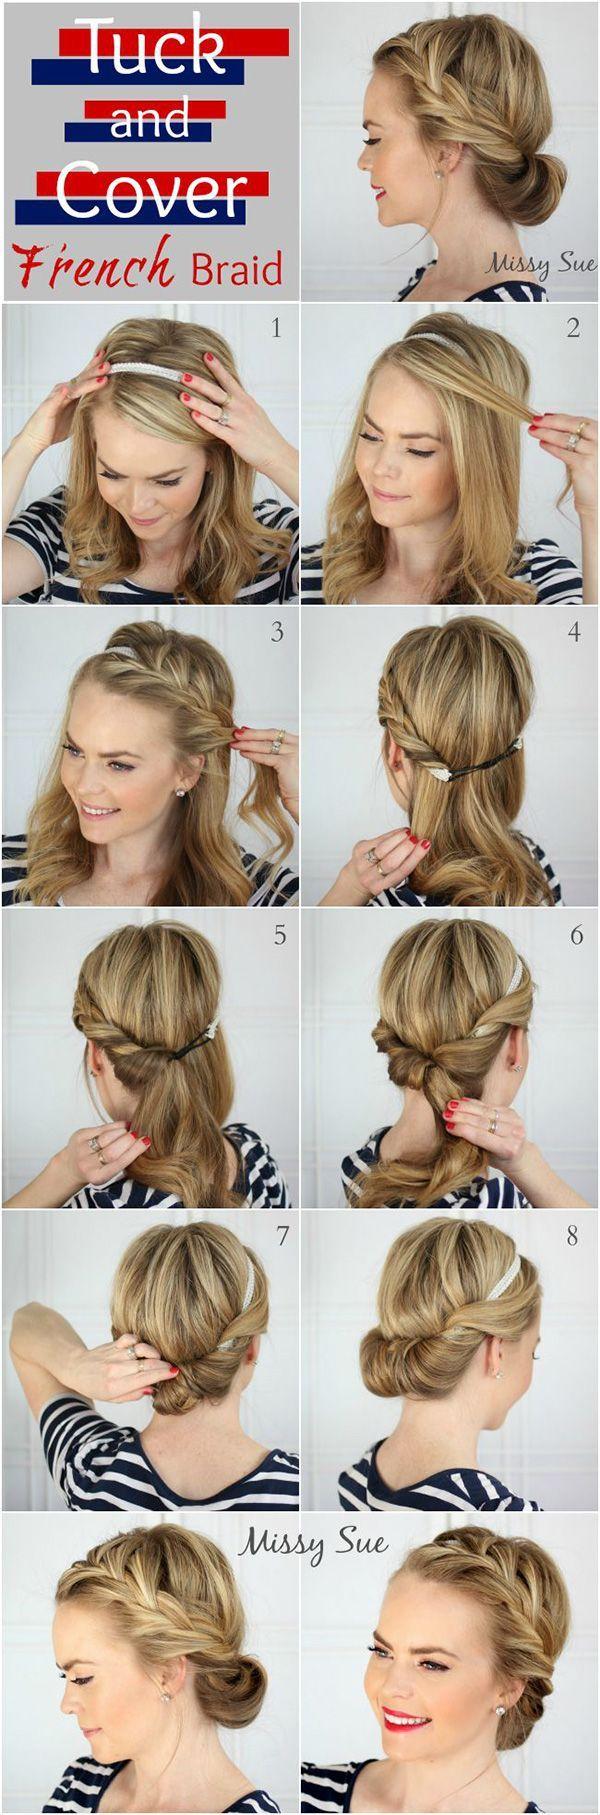 best 25+ 1920s long hair ideas on pinterest | flapper hairstyles